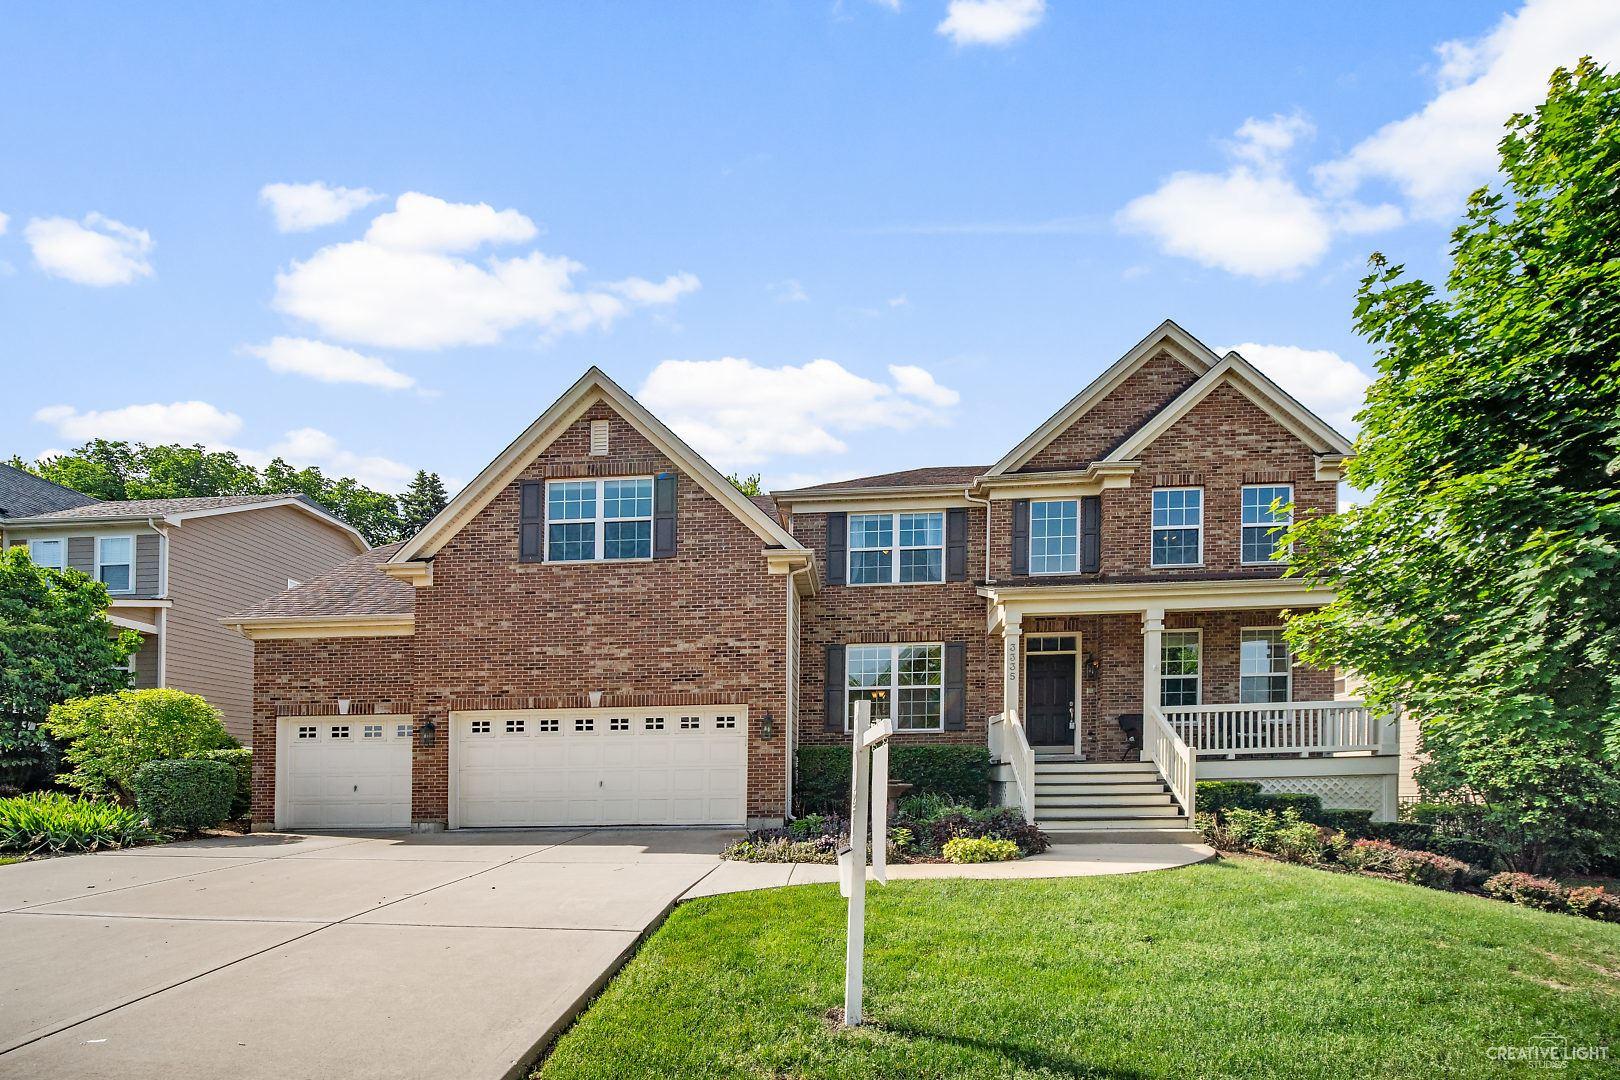 Photo for 3335 Noble Drive, Woodridge, IL 60517 (MLS # 10859948)